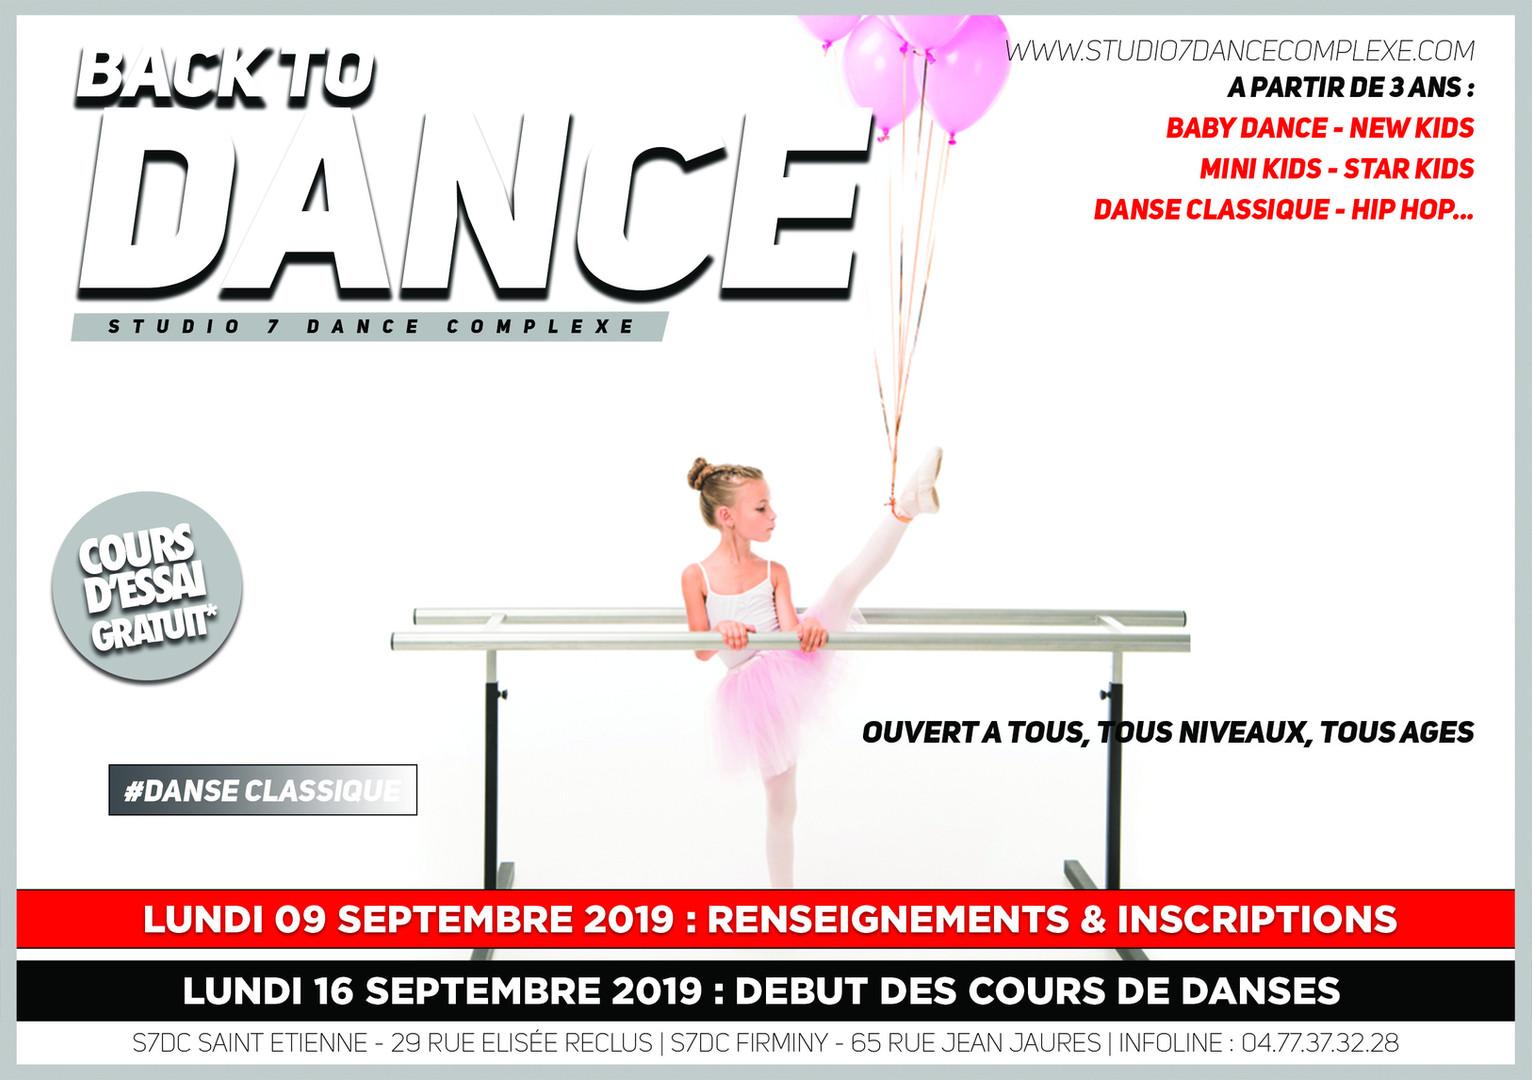 BACK TO DANCE 2 - KIDS CLASSIQUE 2.jpg